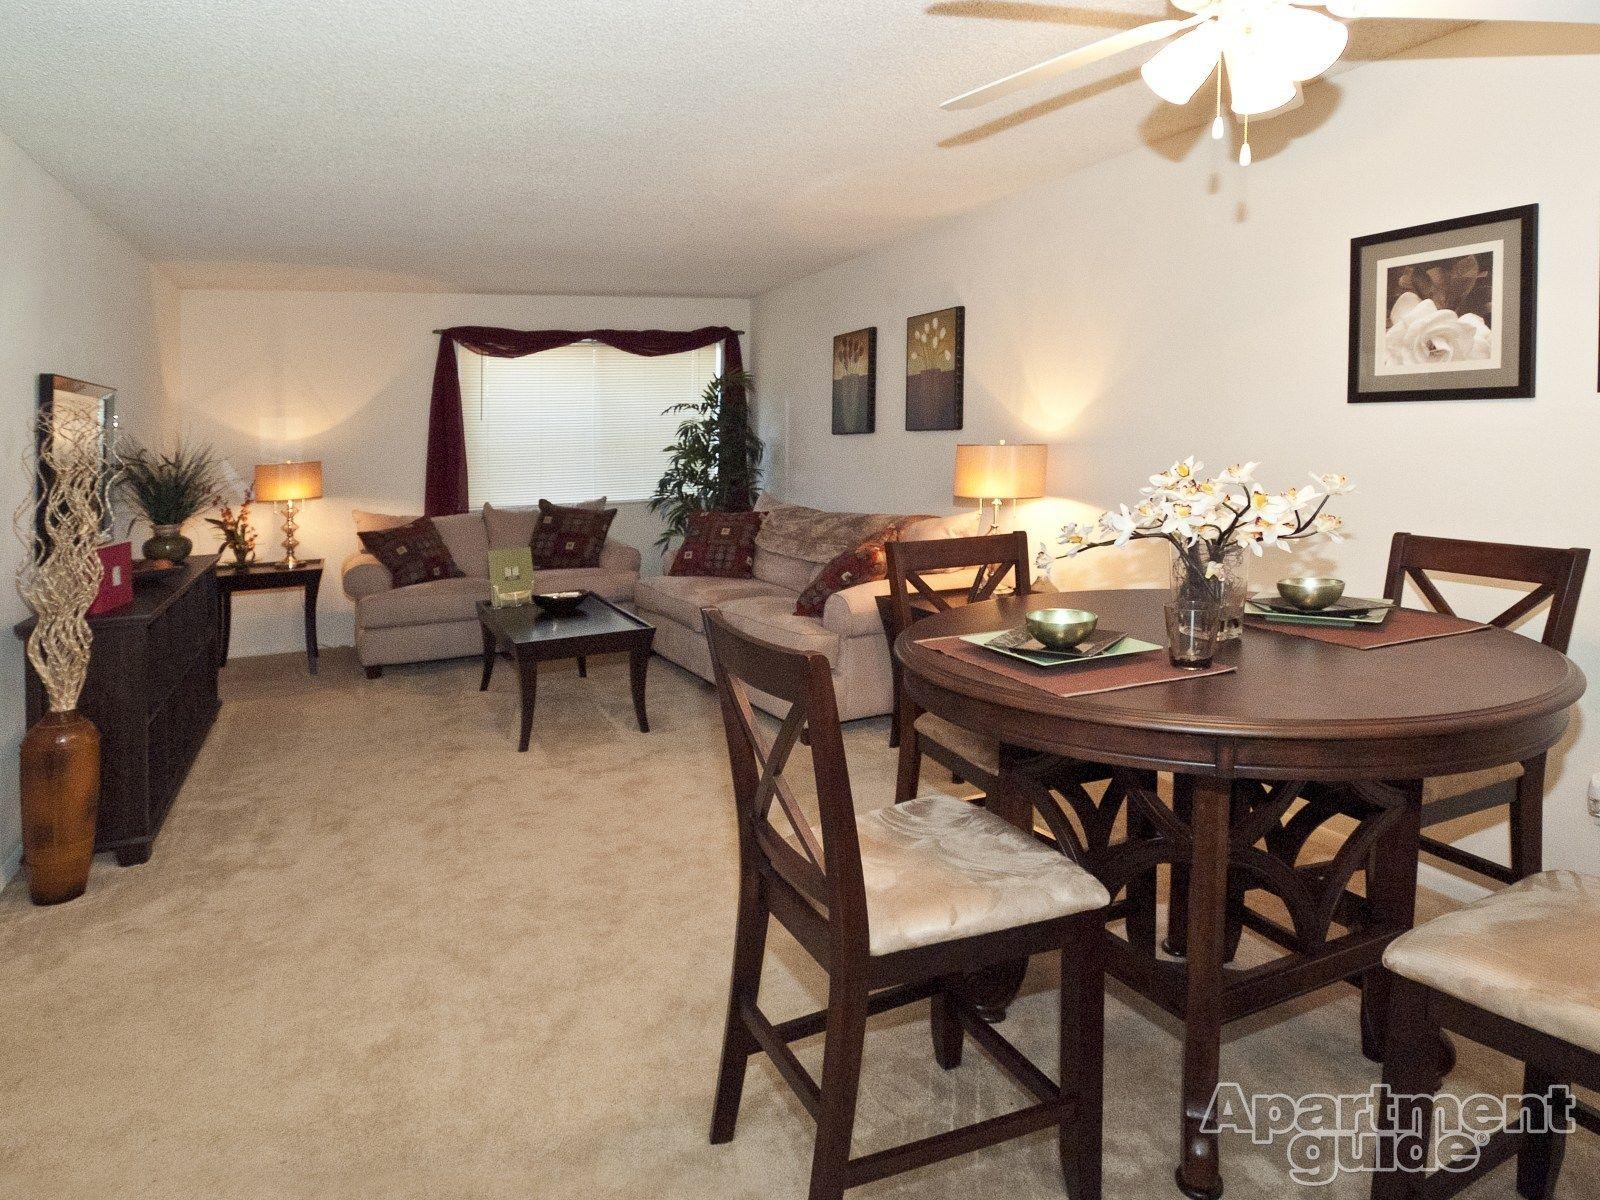 Tara Hills Apartments Oak Ridge Tn 37830 Apartments For Rent Home Decor Dining Table Oak Ridge